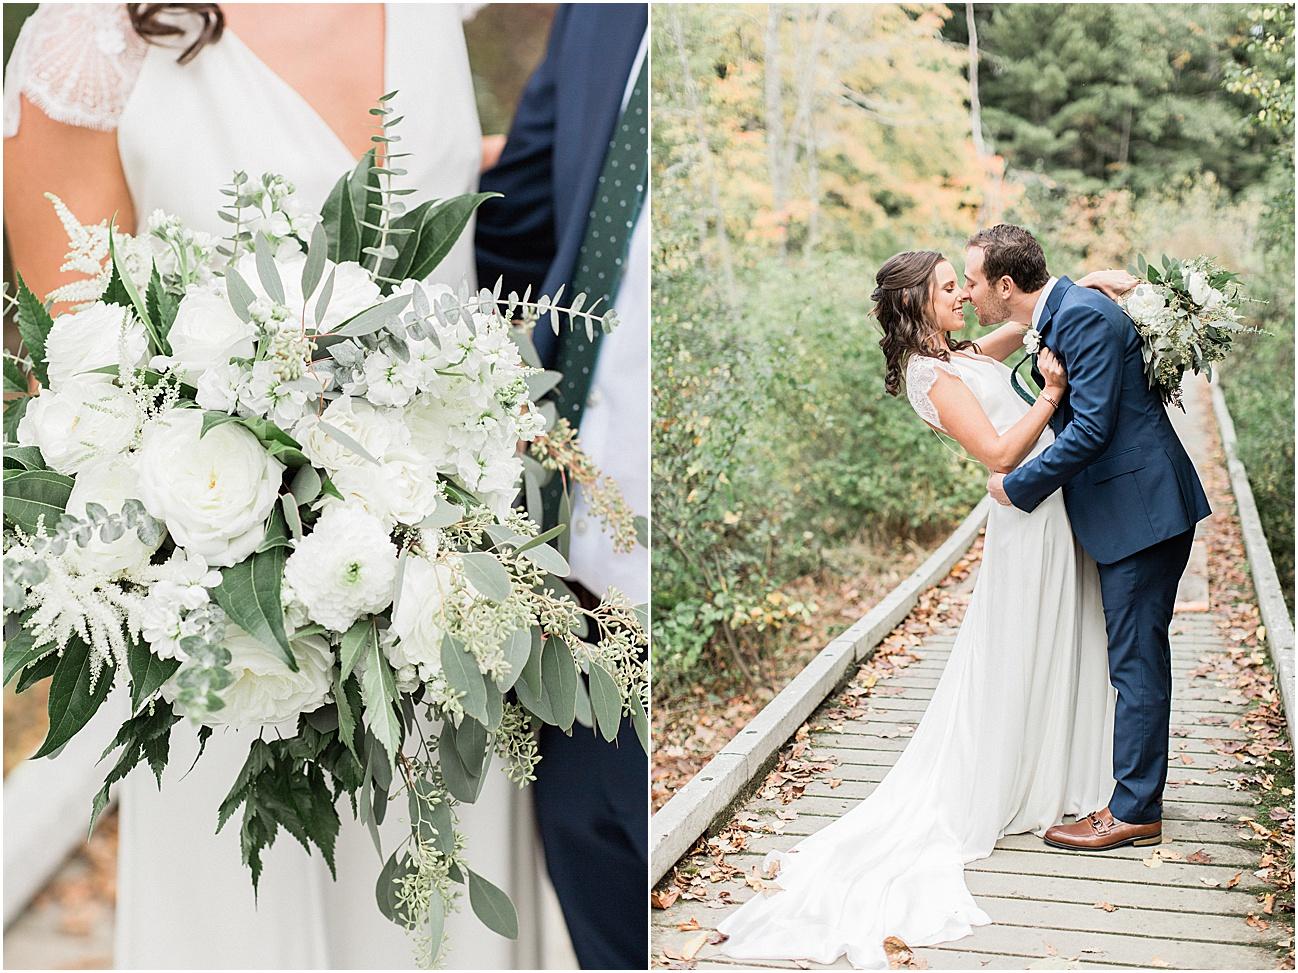 jenna_mike_willowdale_estate_topsfield_neutral_whites_greens_fall_cape_cod_boston_wedding_photographer_meredith_jane_photography_photo_1437.jpg